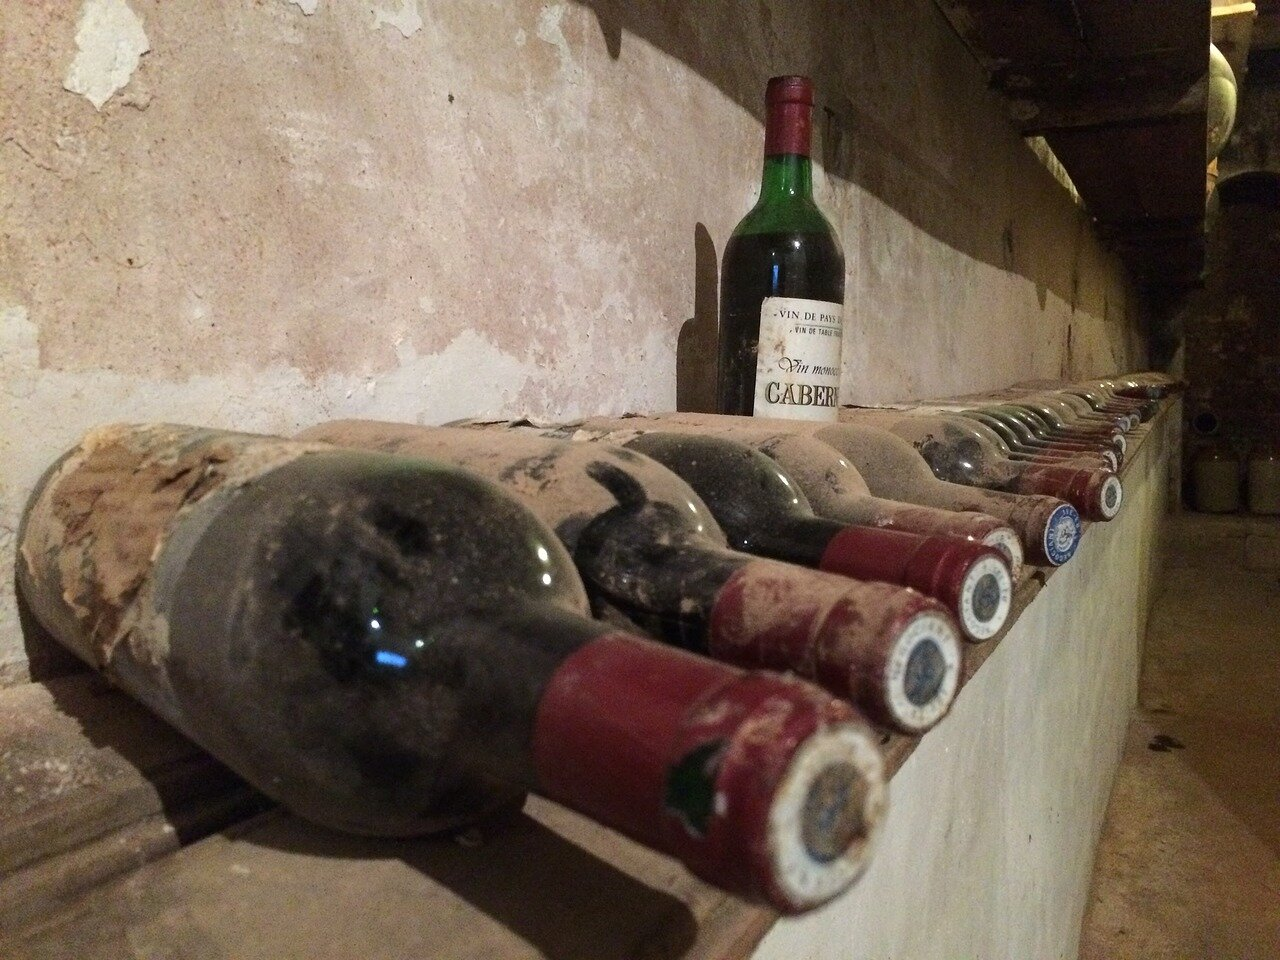 wine cellared cabernet.jpg